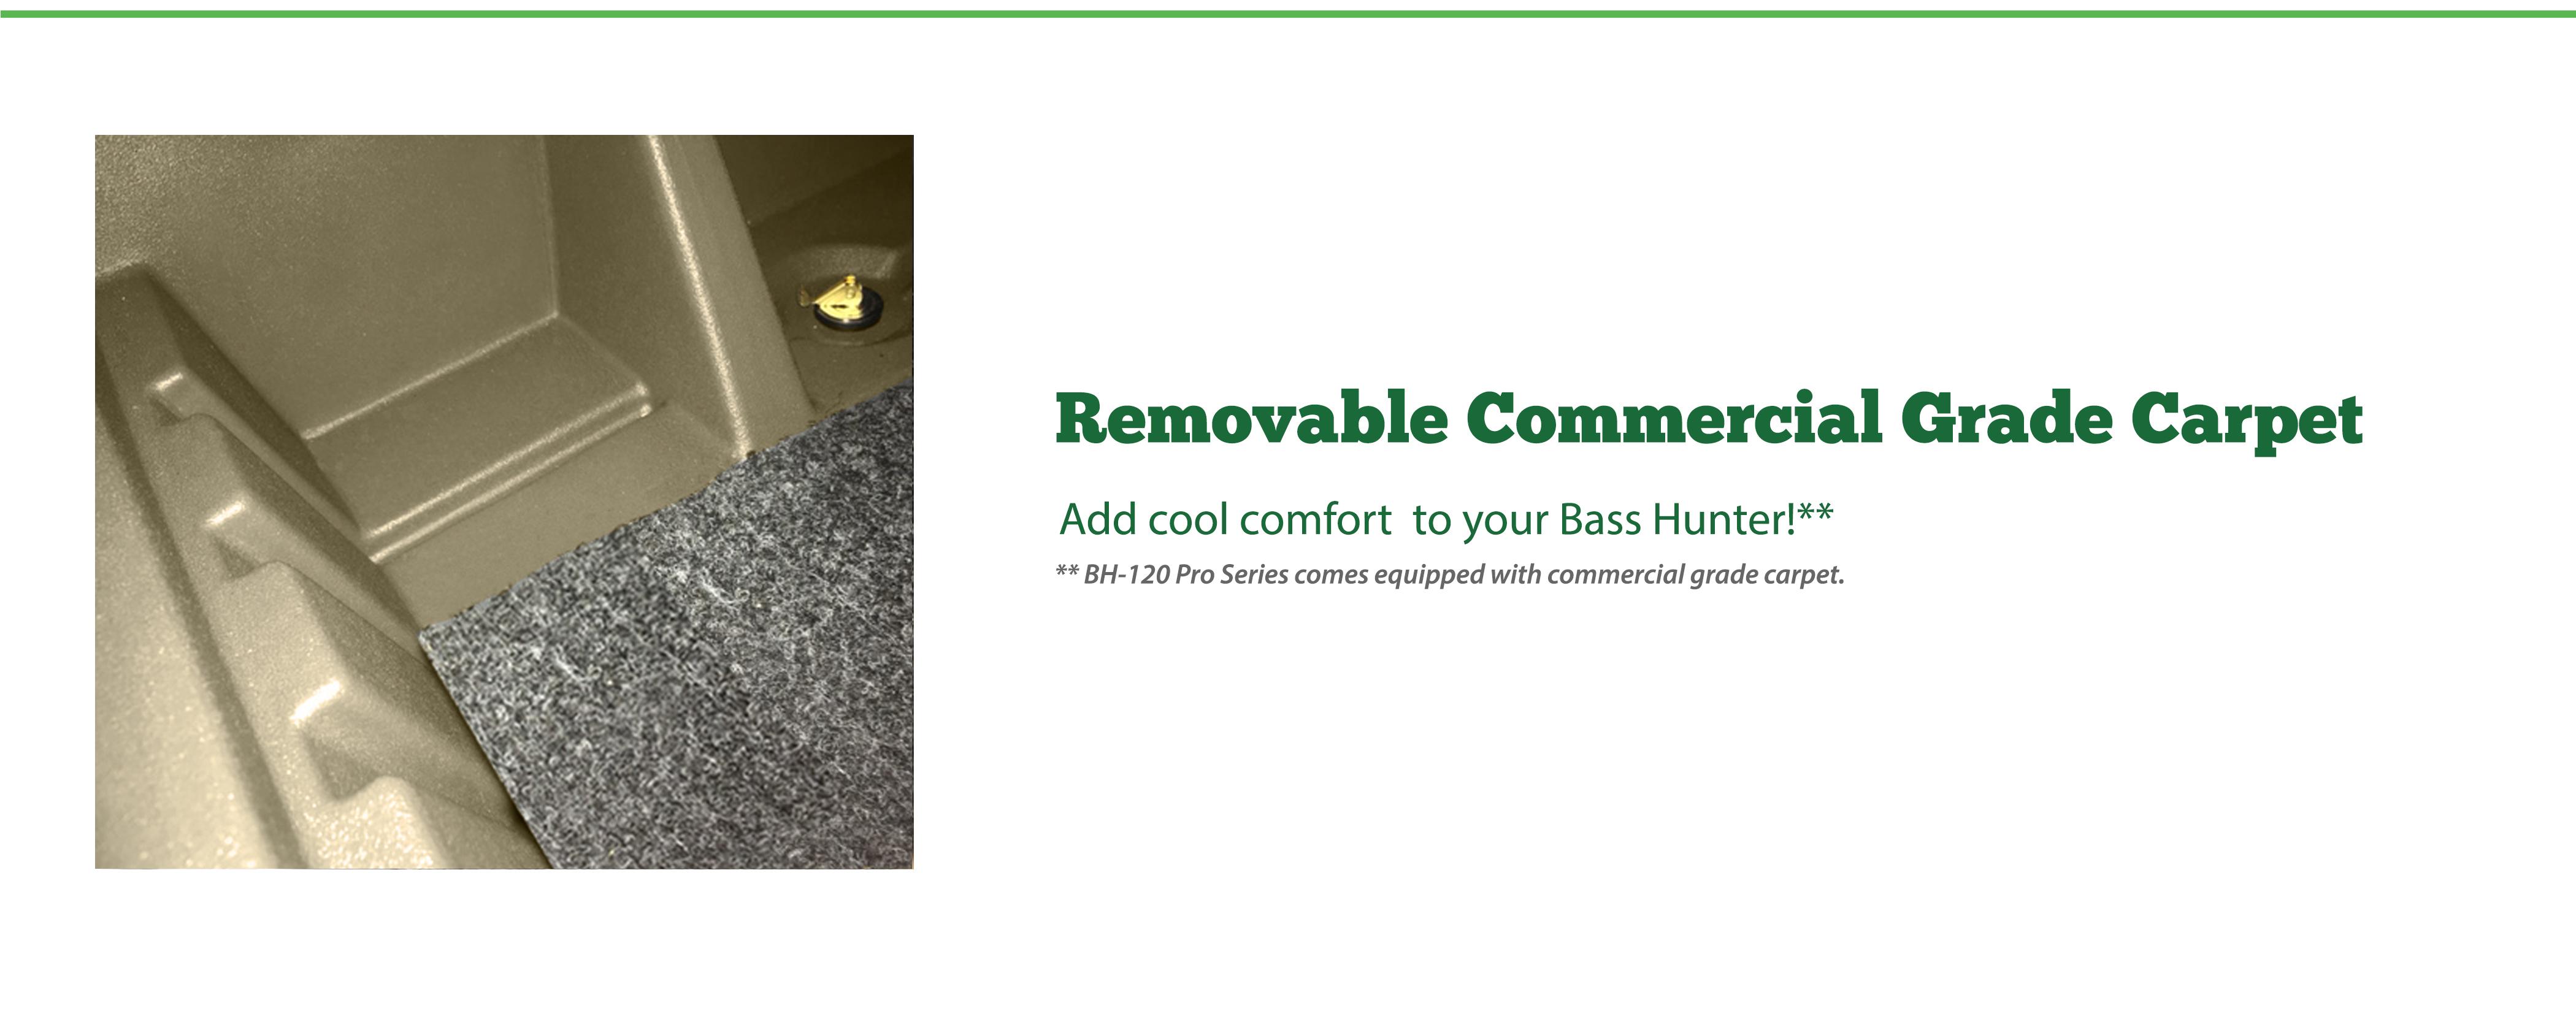 Removable Commercial Grade Carpet